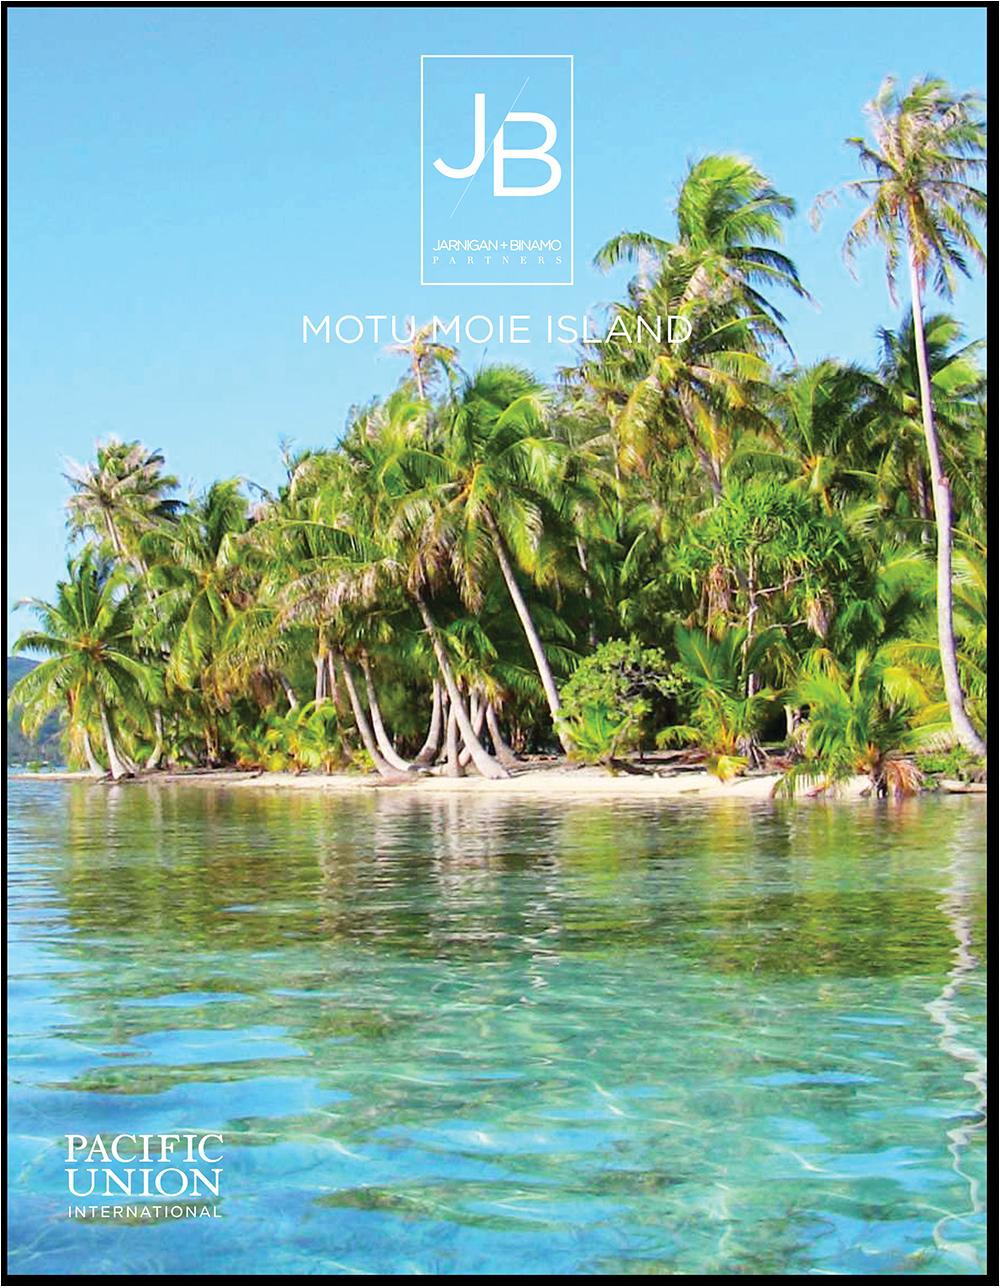 Motu Moie Magazine Thumbnail 1000px.png